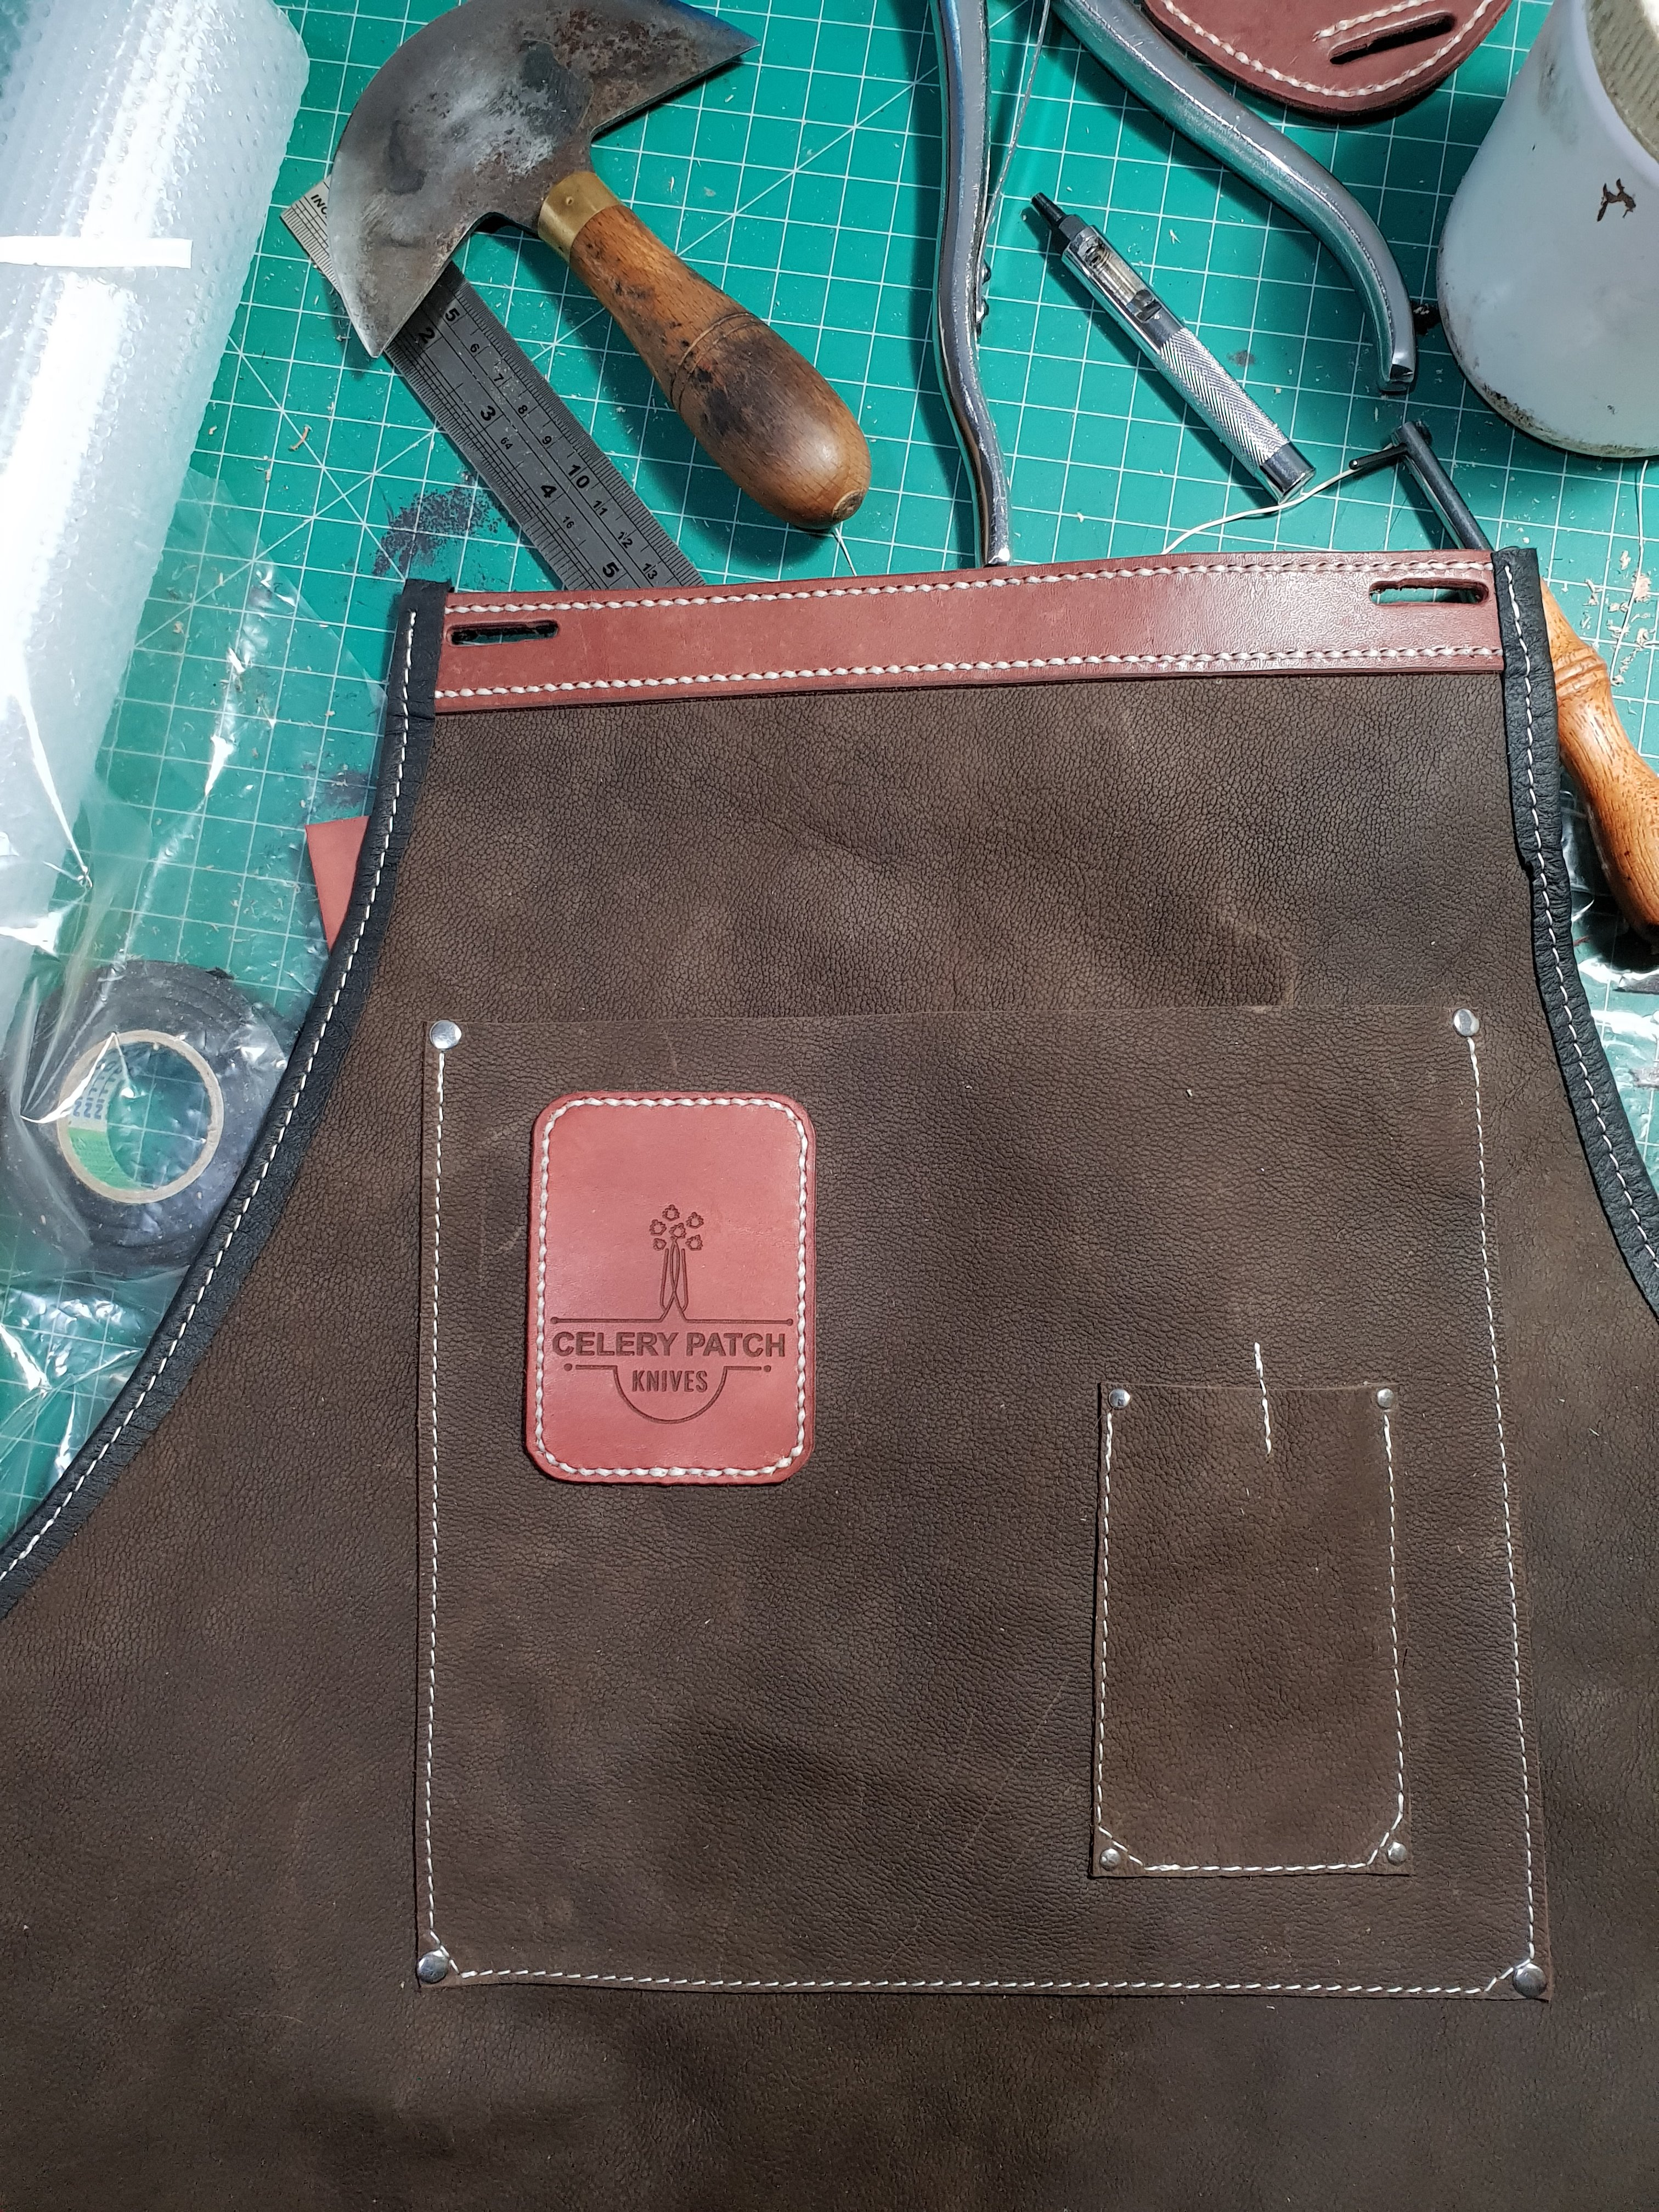 Make a Simple Leather Apron